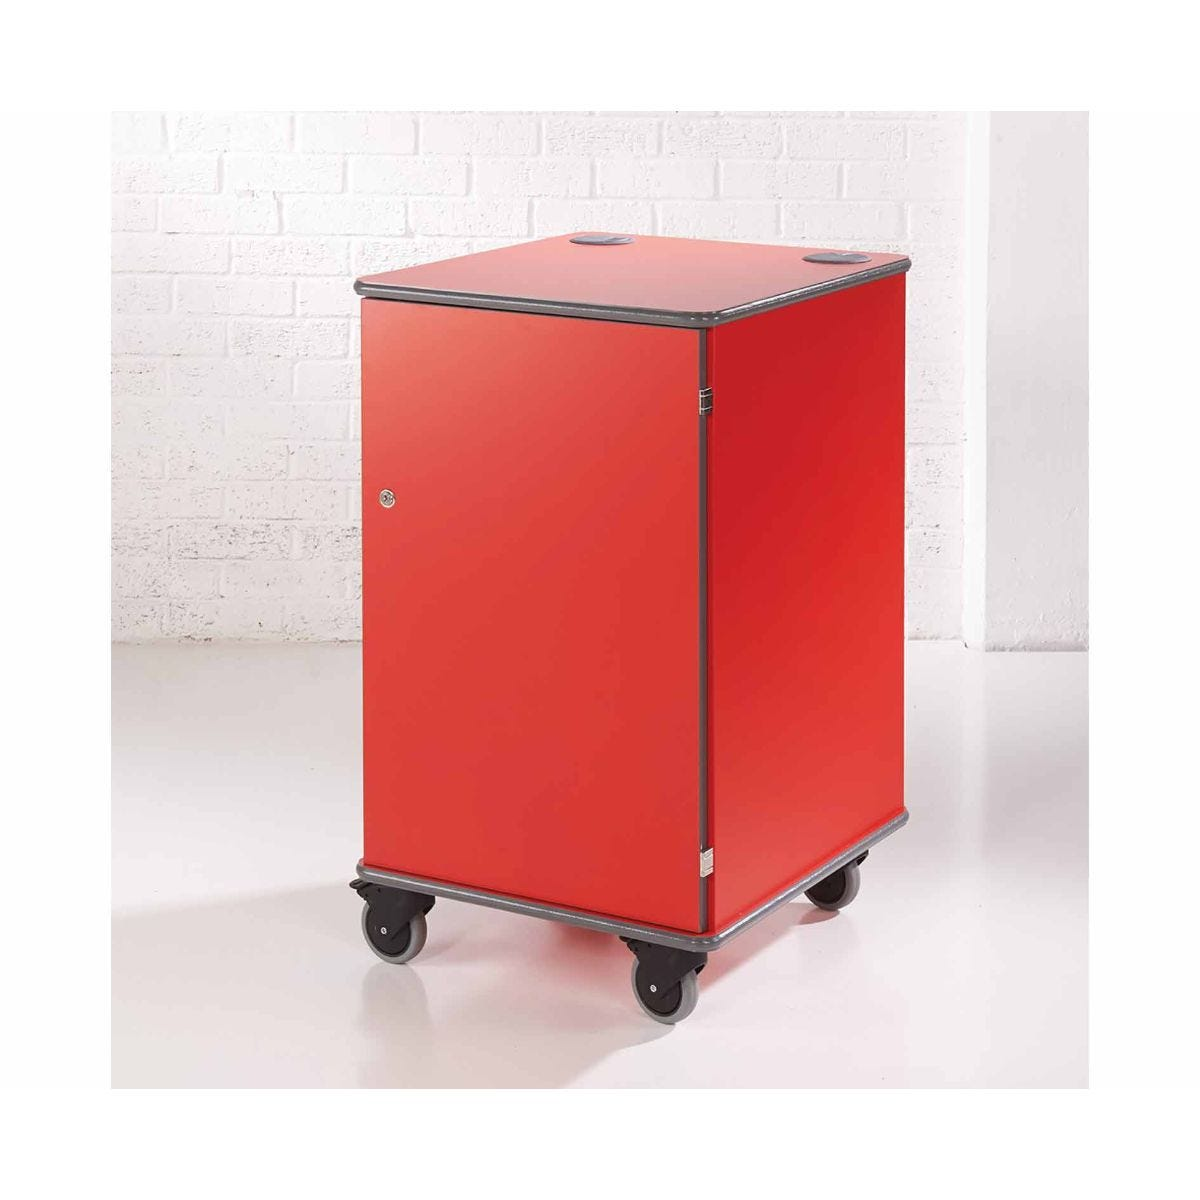 Metroplan Multi-Media Projector Cabinet, Red